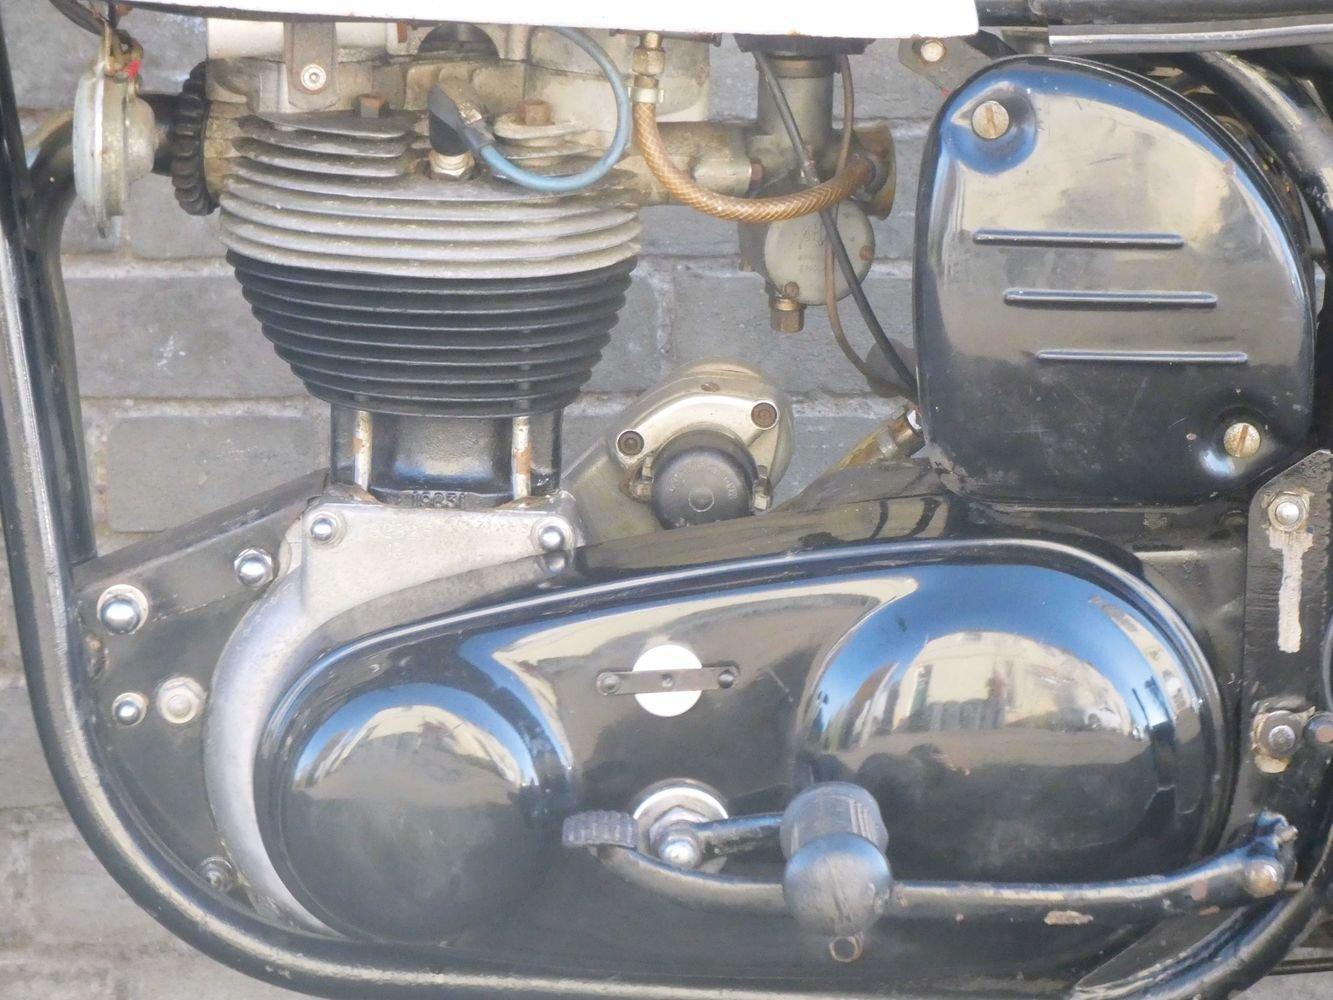 1960 Norton Model 50 350cc For Sale (picture 4 of 6)